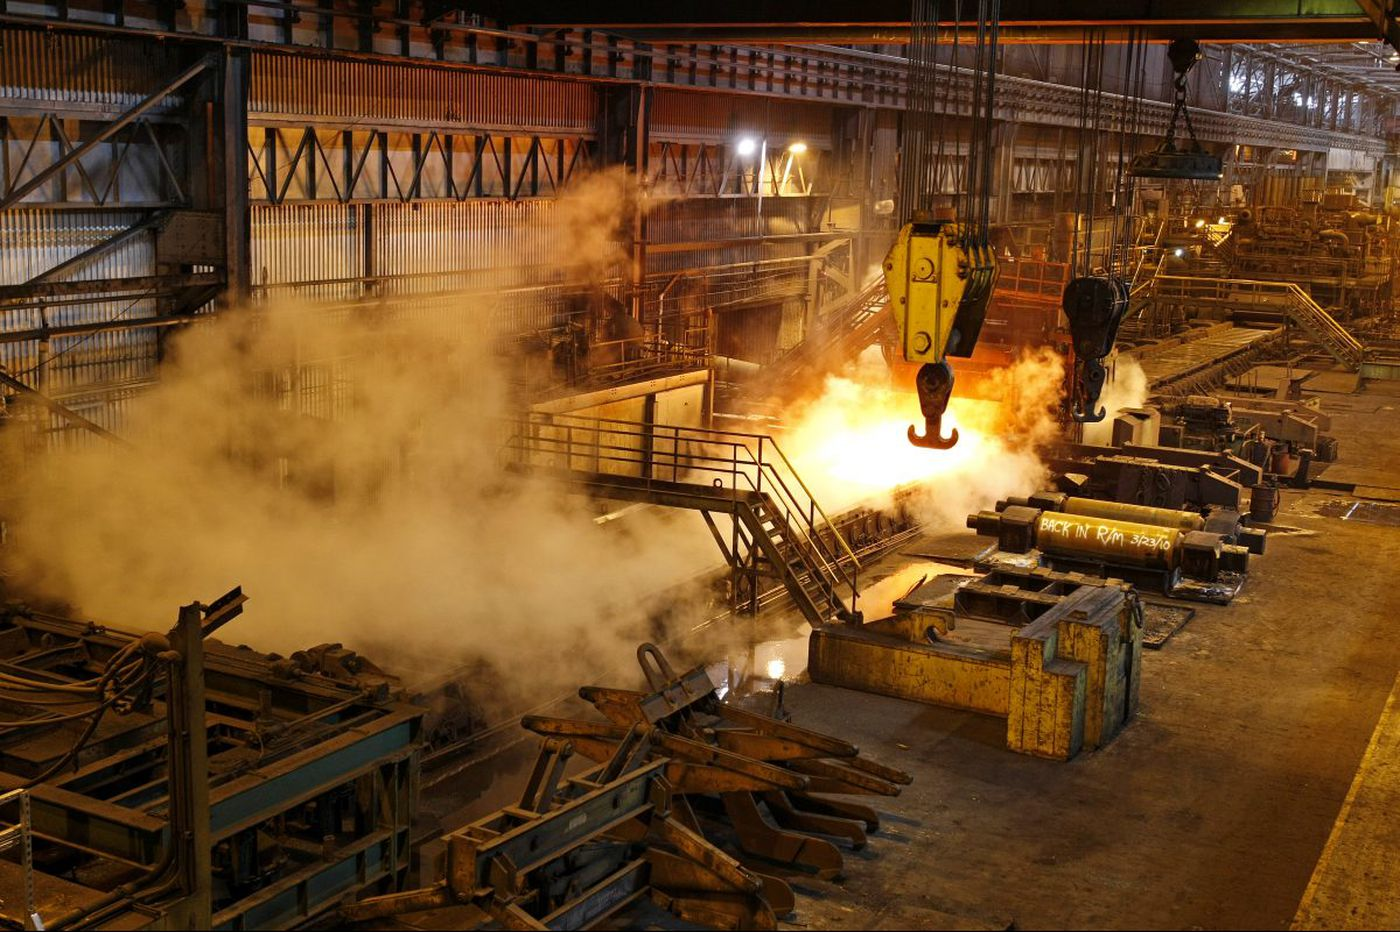 Conshohocken Steel Plant May Change Owners, Add Jobs